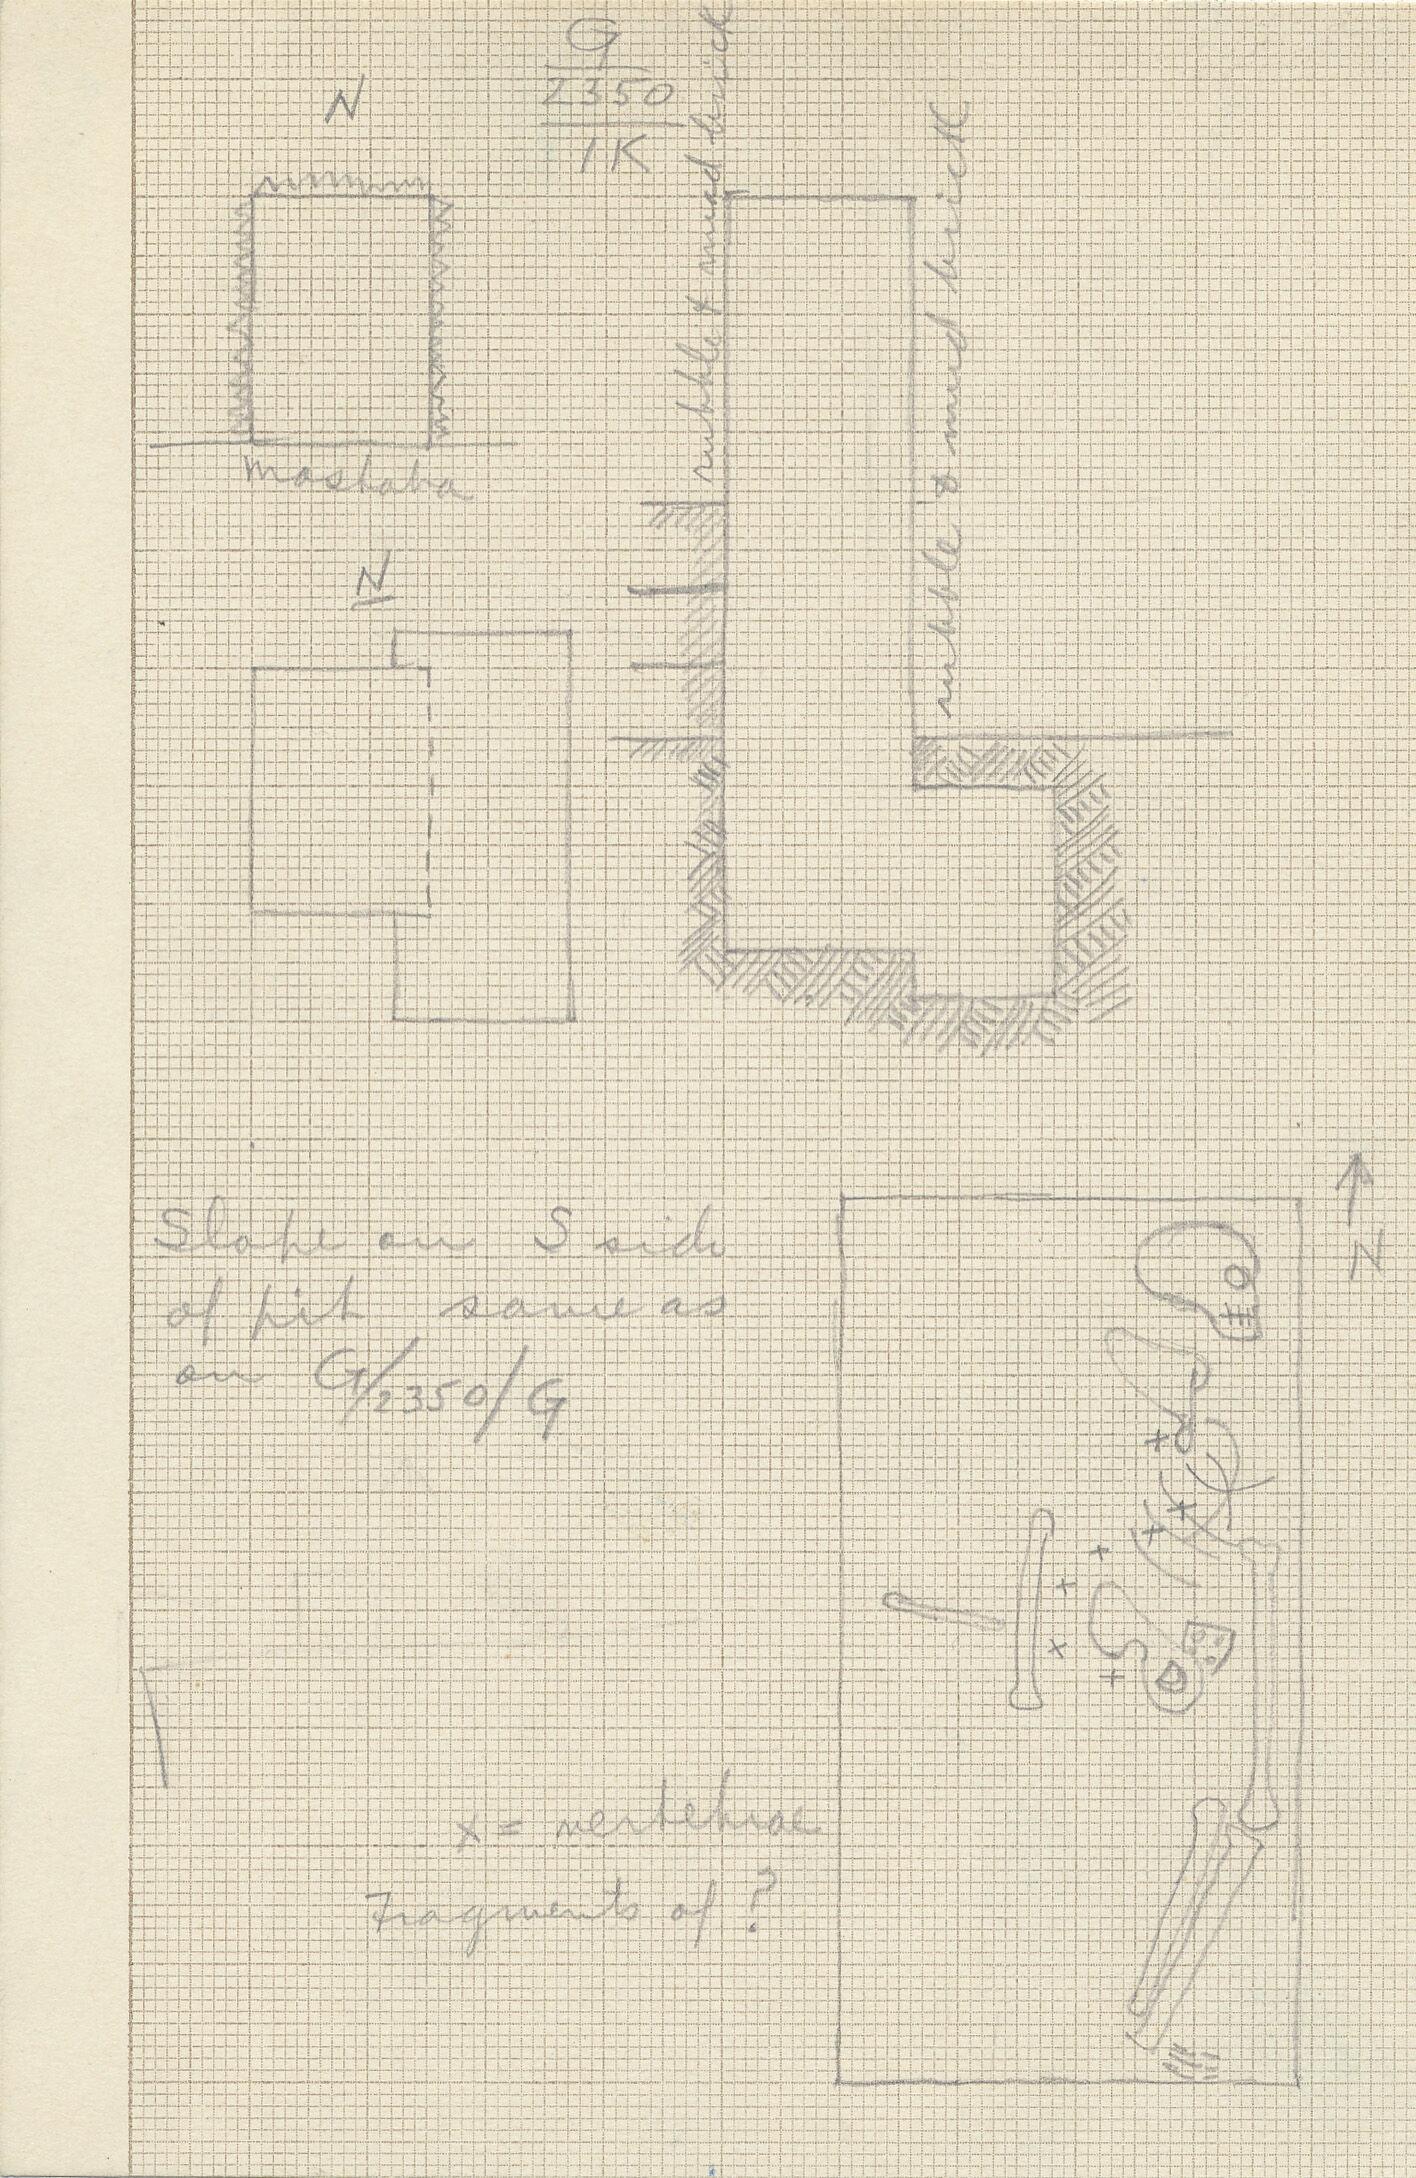 Maps and plans: G 2350 = G 5290, Shaft I K